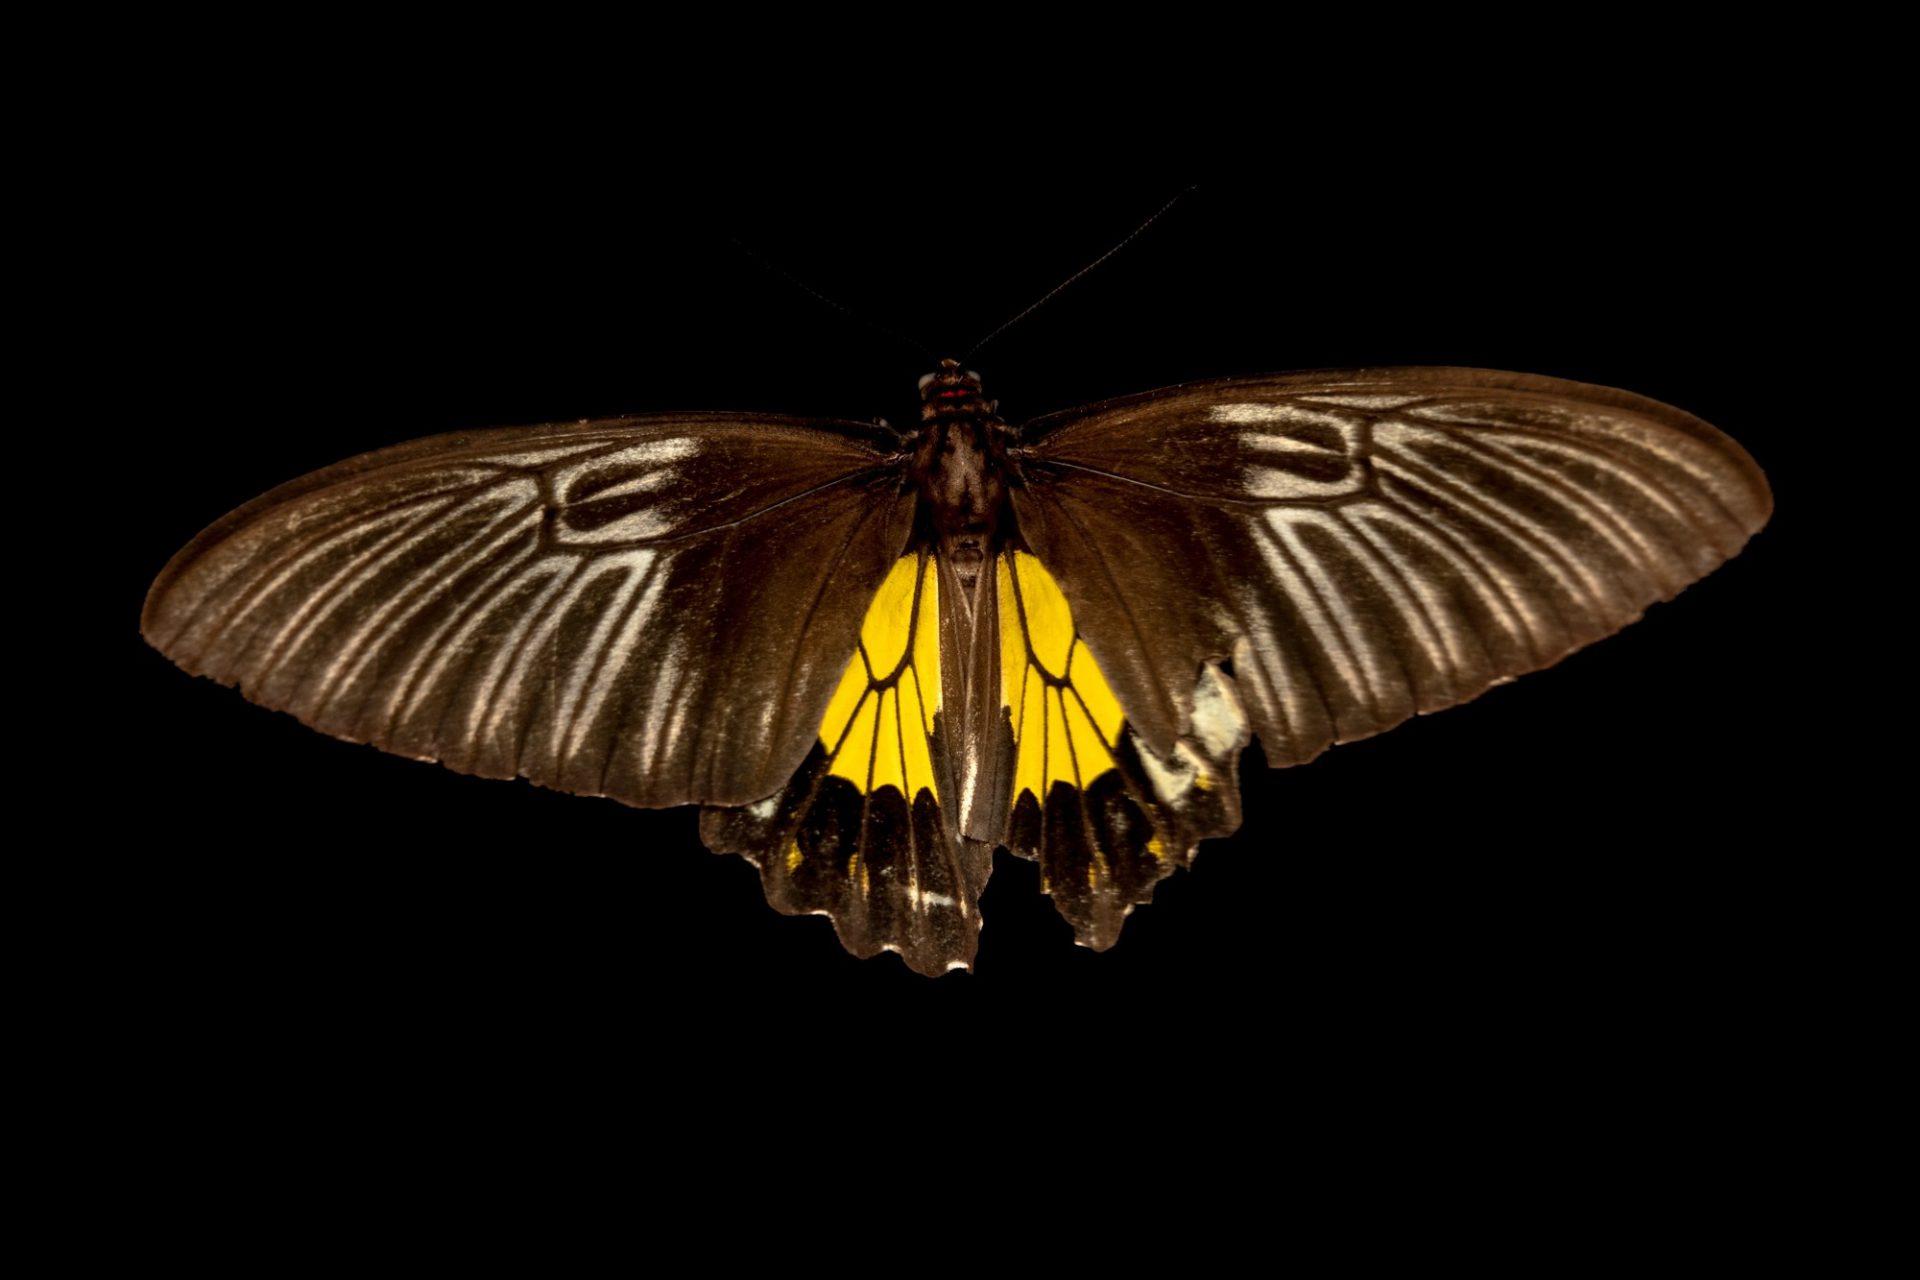 Photo: A golden birdwing (Troides rhadamantus rhadamantus) at Davao Butterfly House.